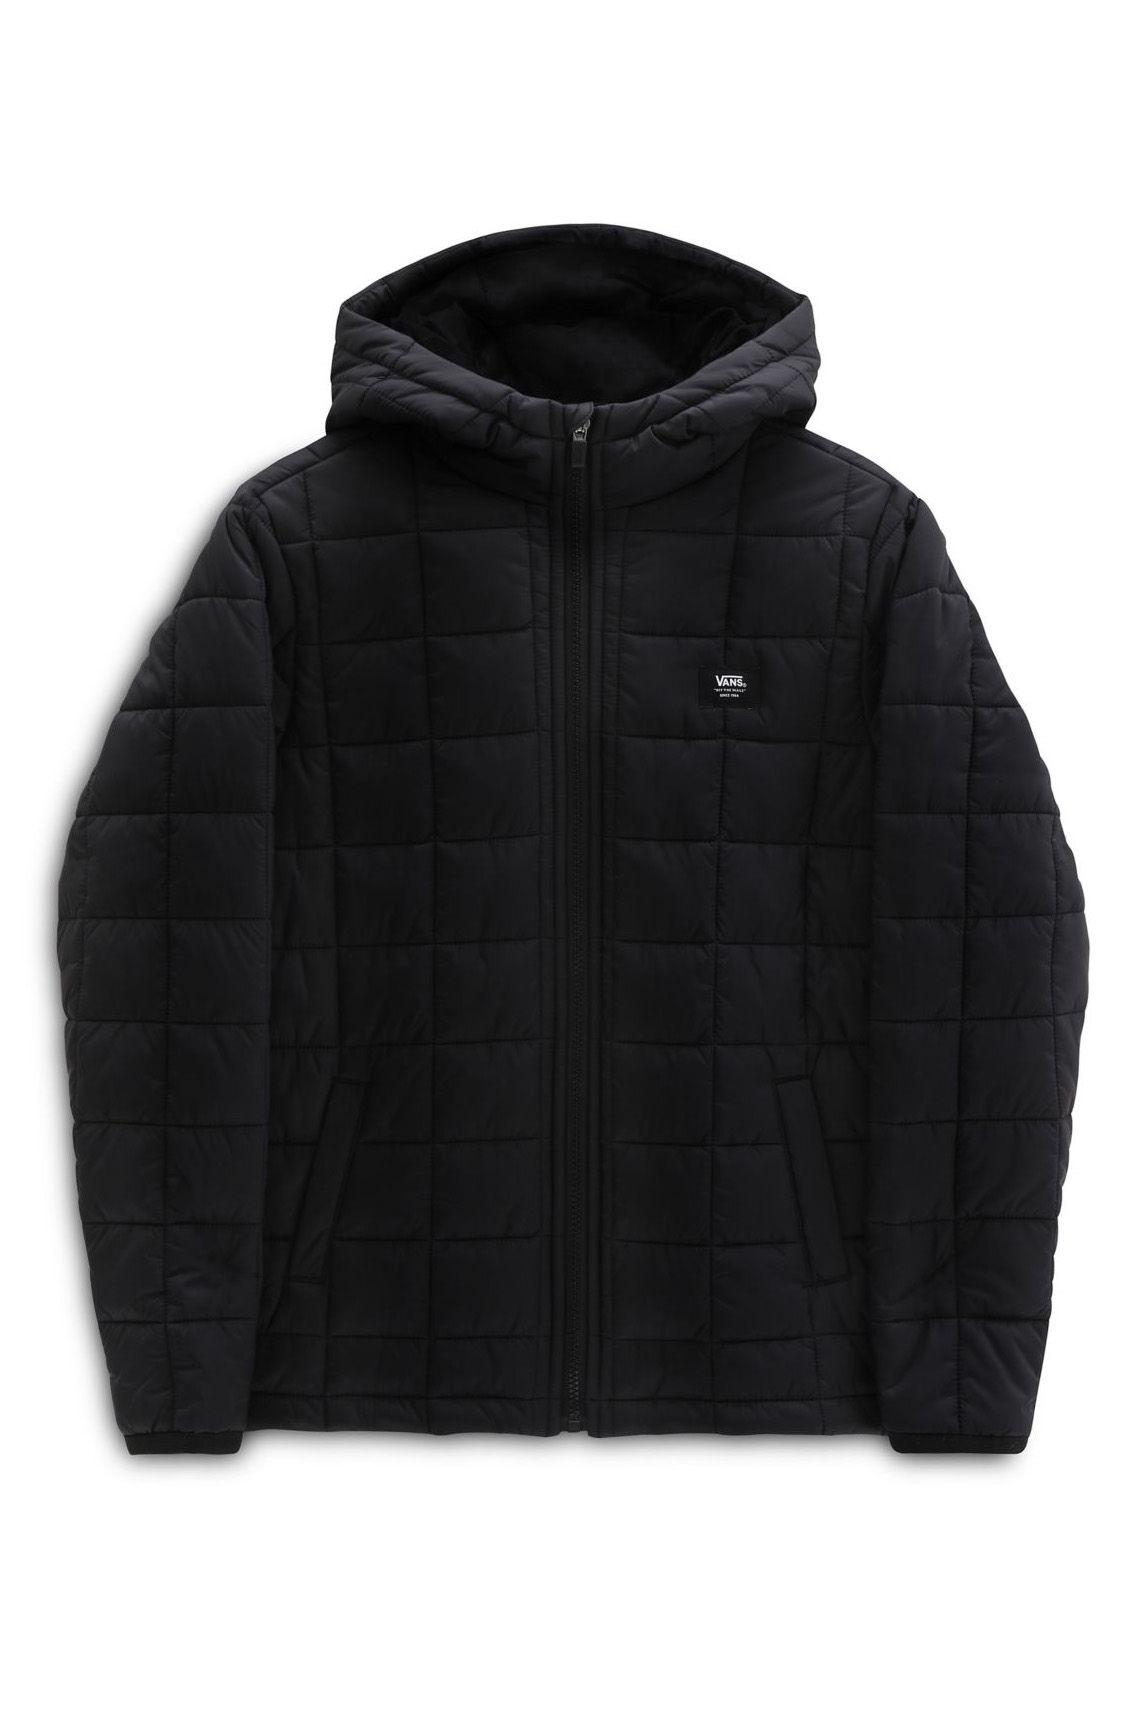 Vans Jacket WOODBRIDGE 2.0 BOYS Black